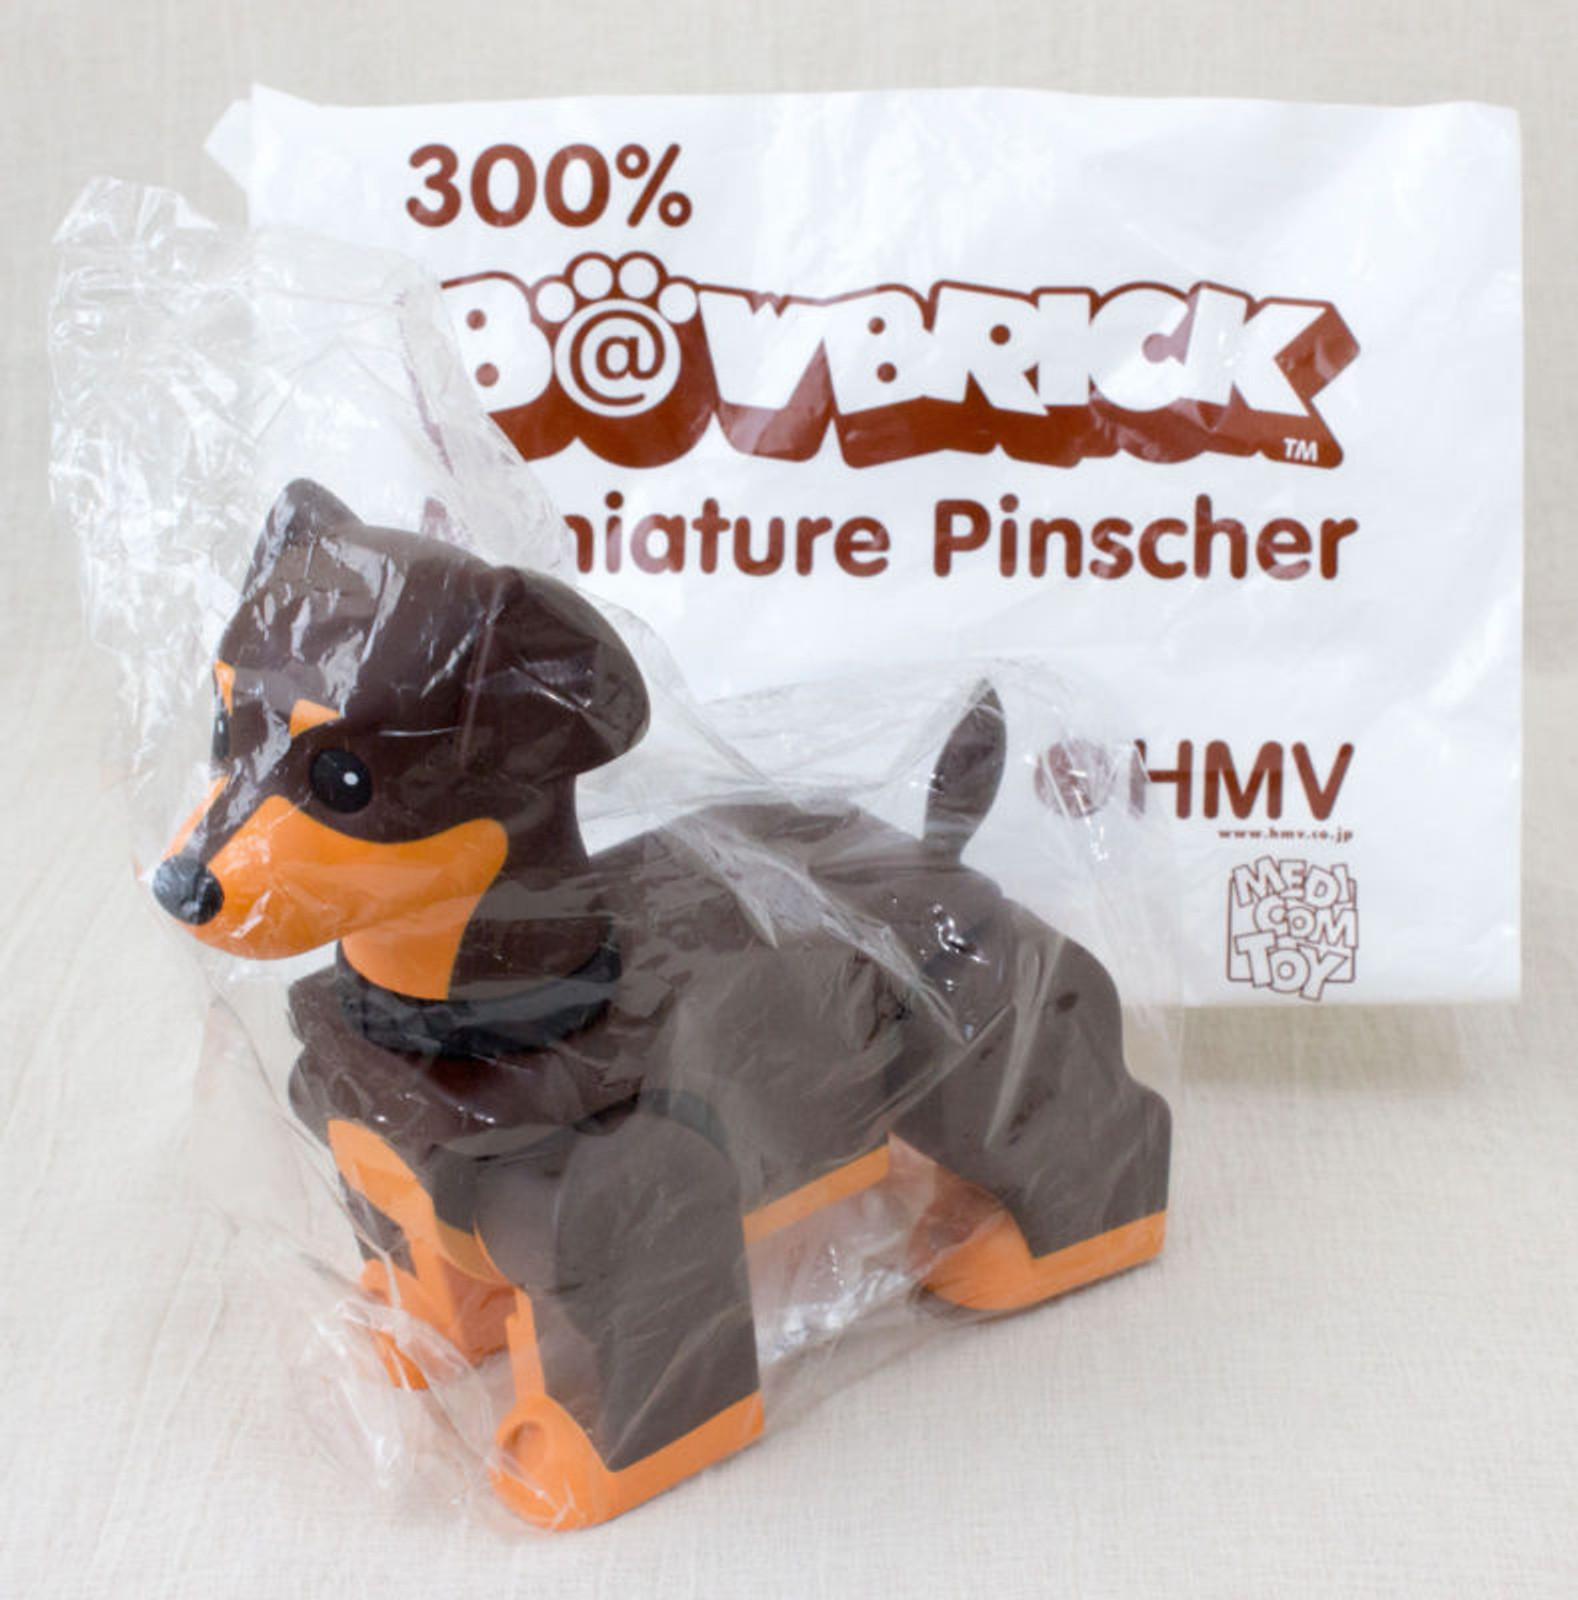 B@WBRICK Bowbrick Miniature Pinscher 300% HMV limited Medicom Toy JAPAN